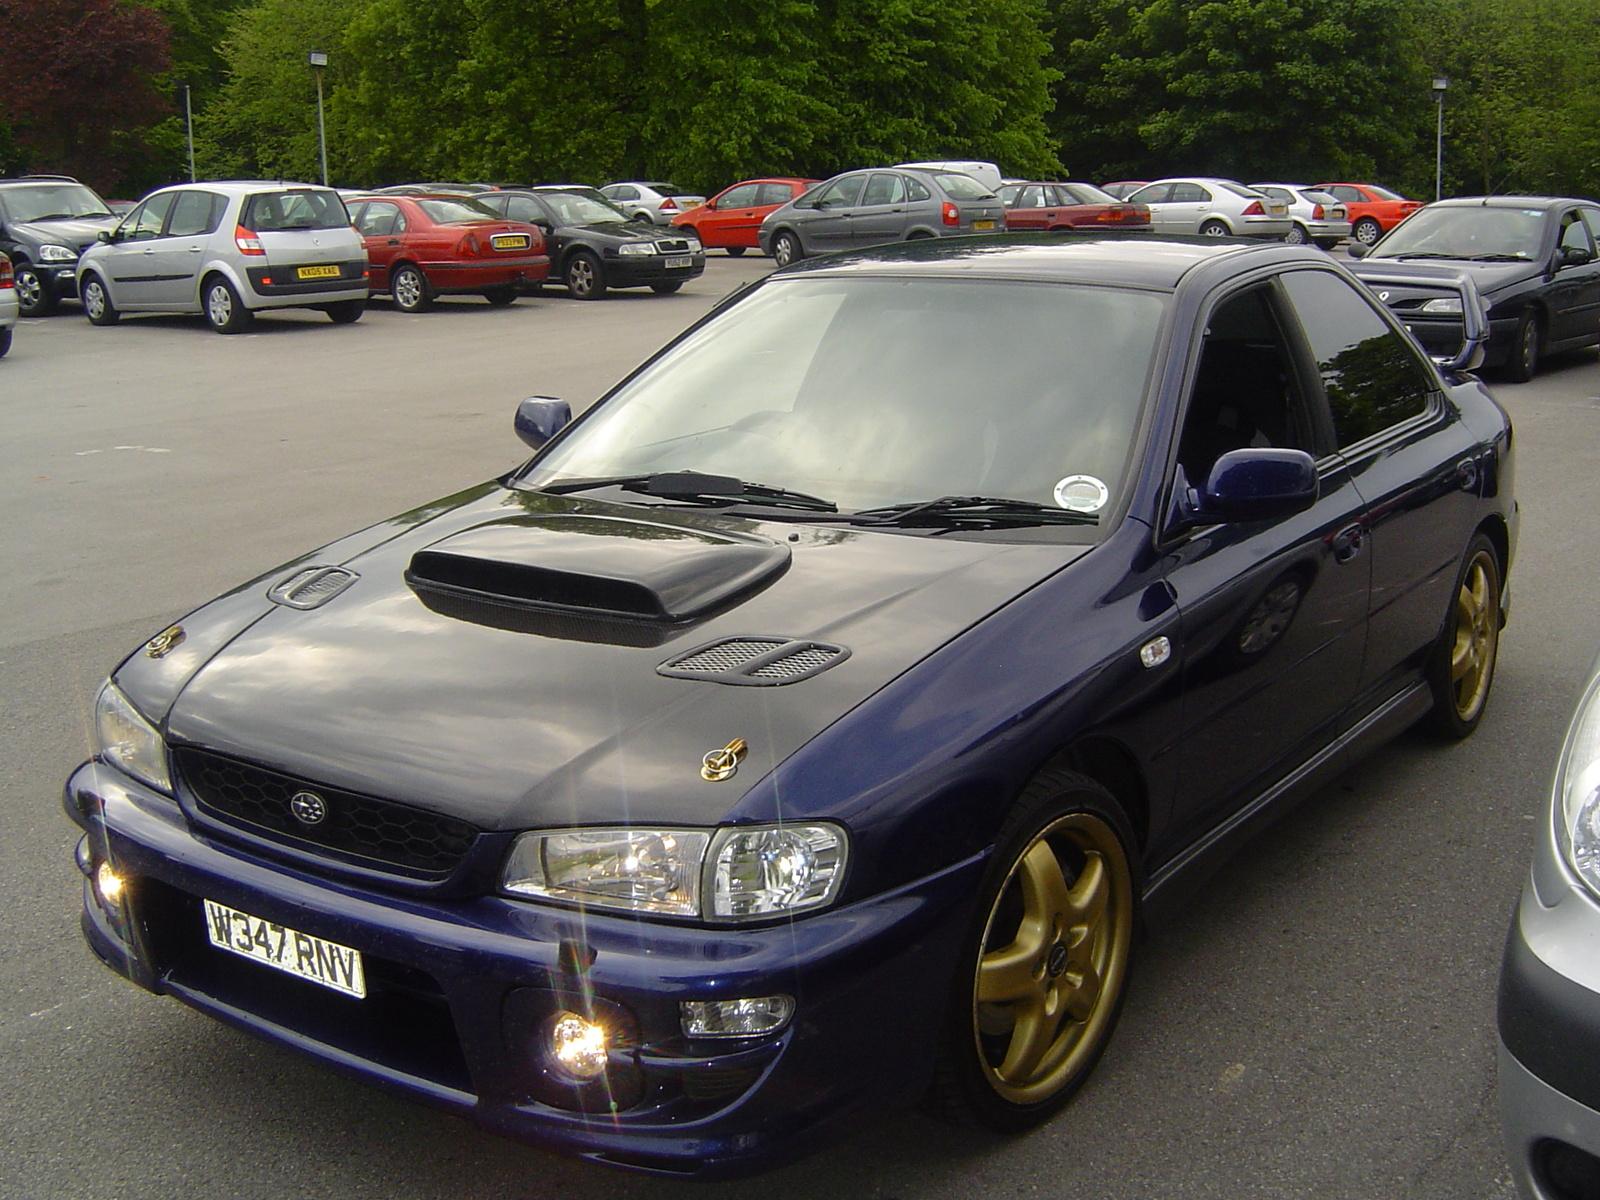 2004 Subaru Impreza Wrx Sti Pictures Cargurus